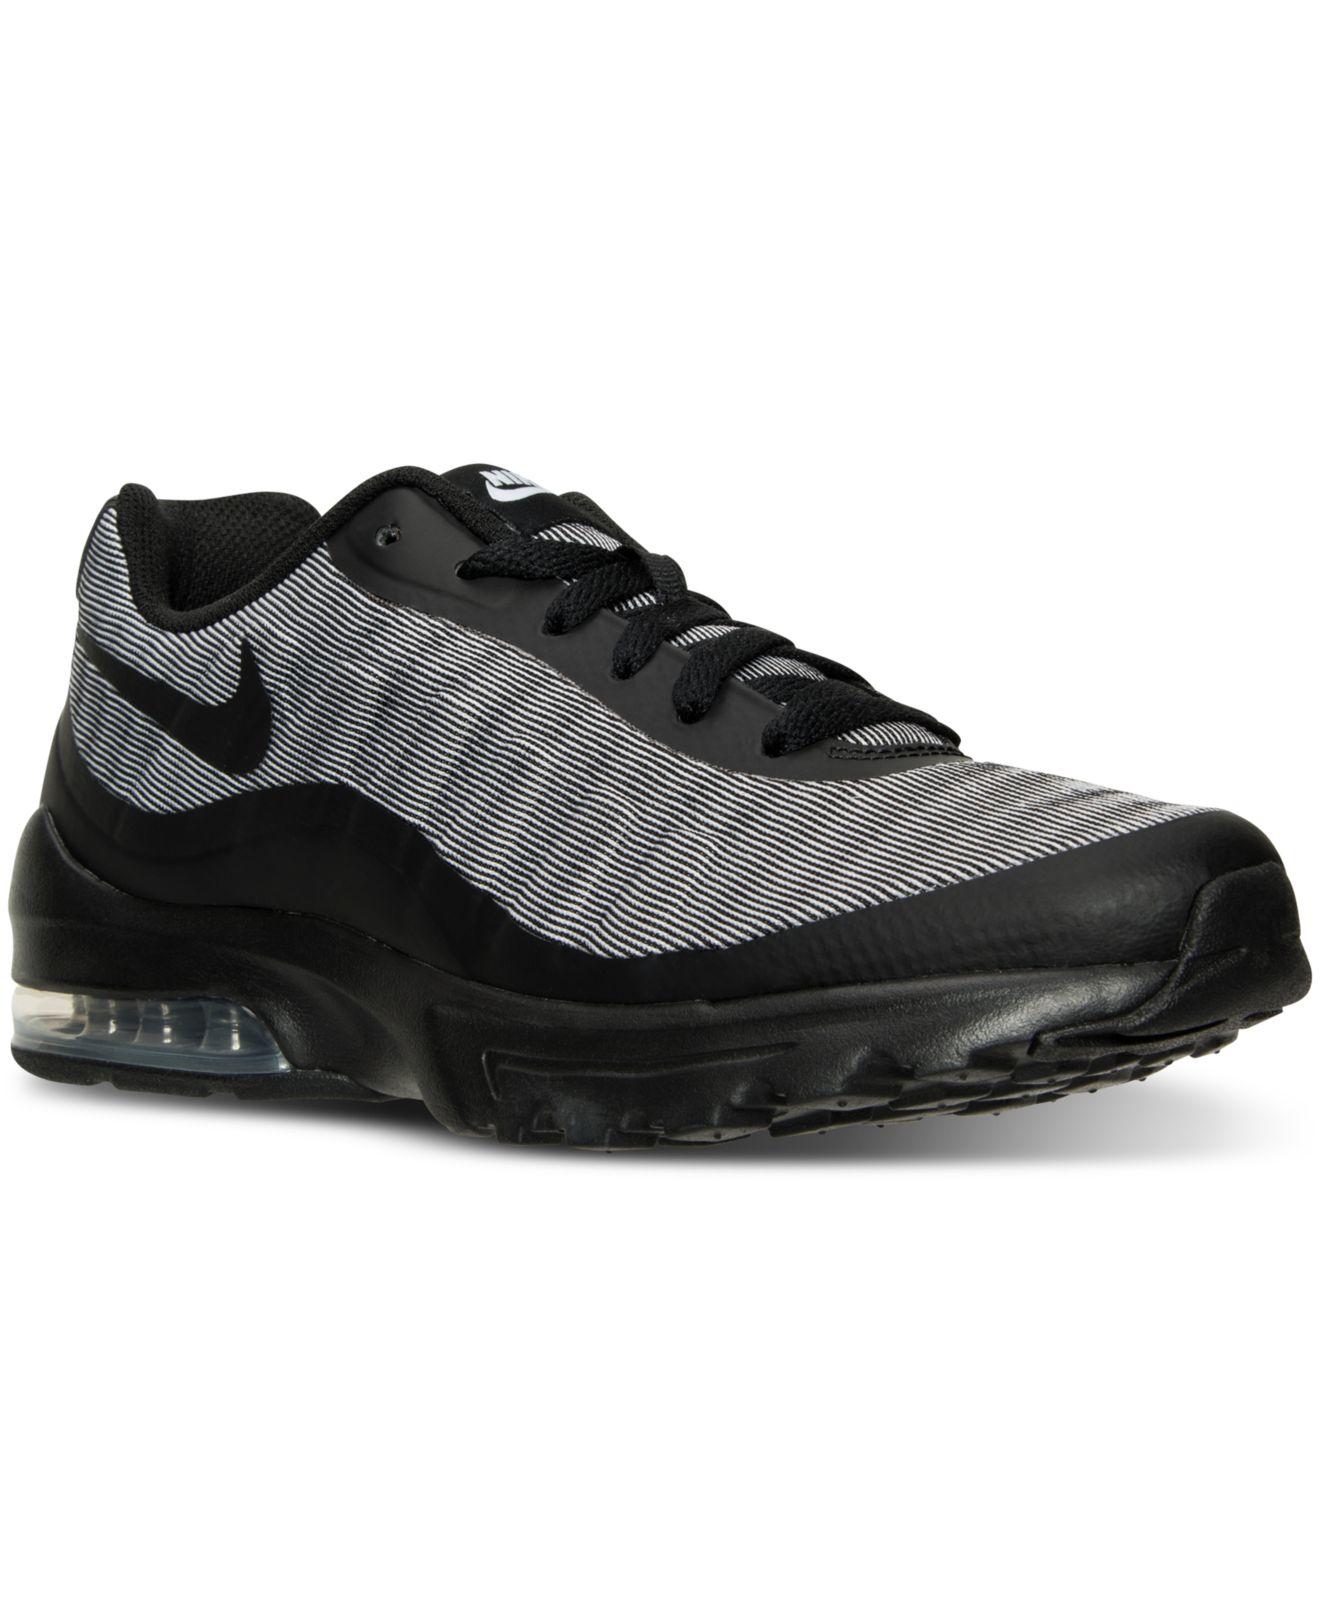 Nike Womens Shoes For Walking Forum